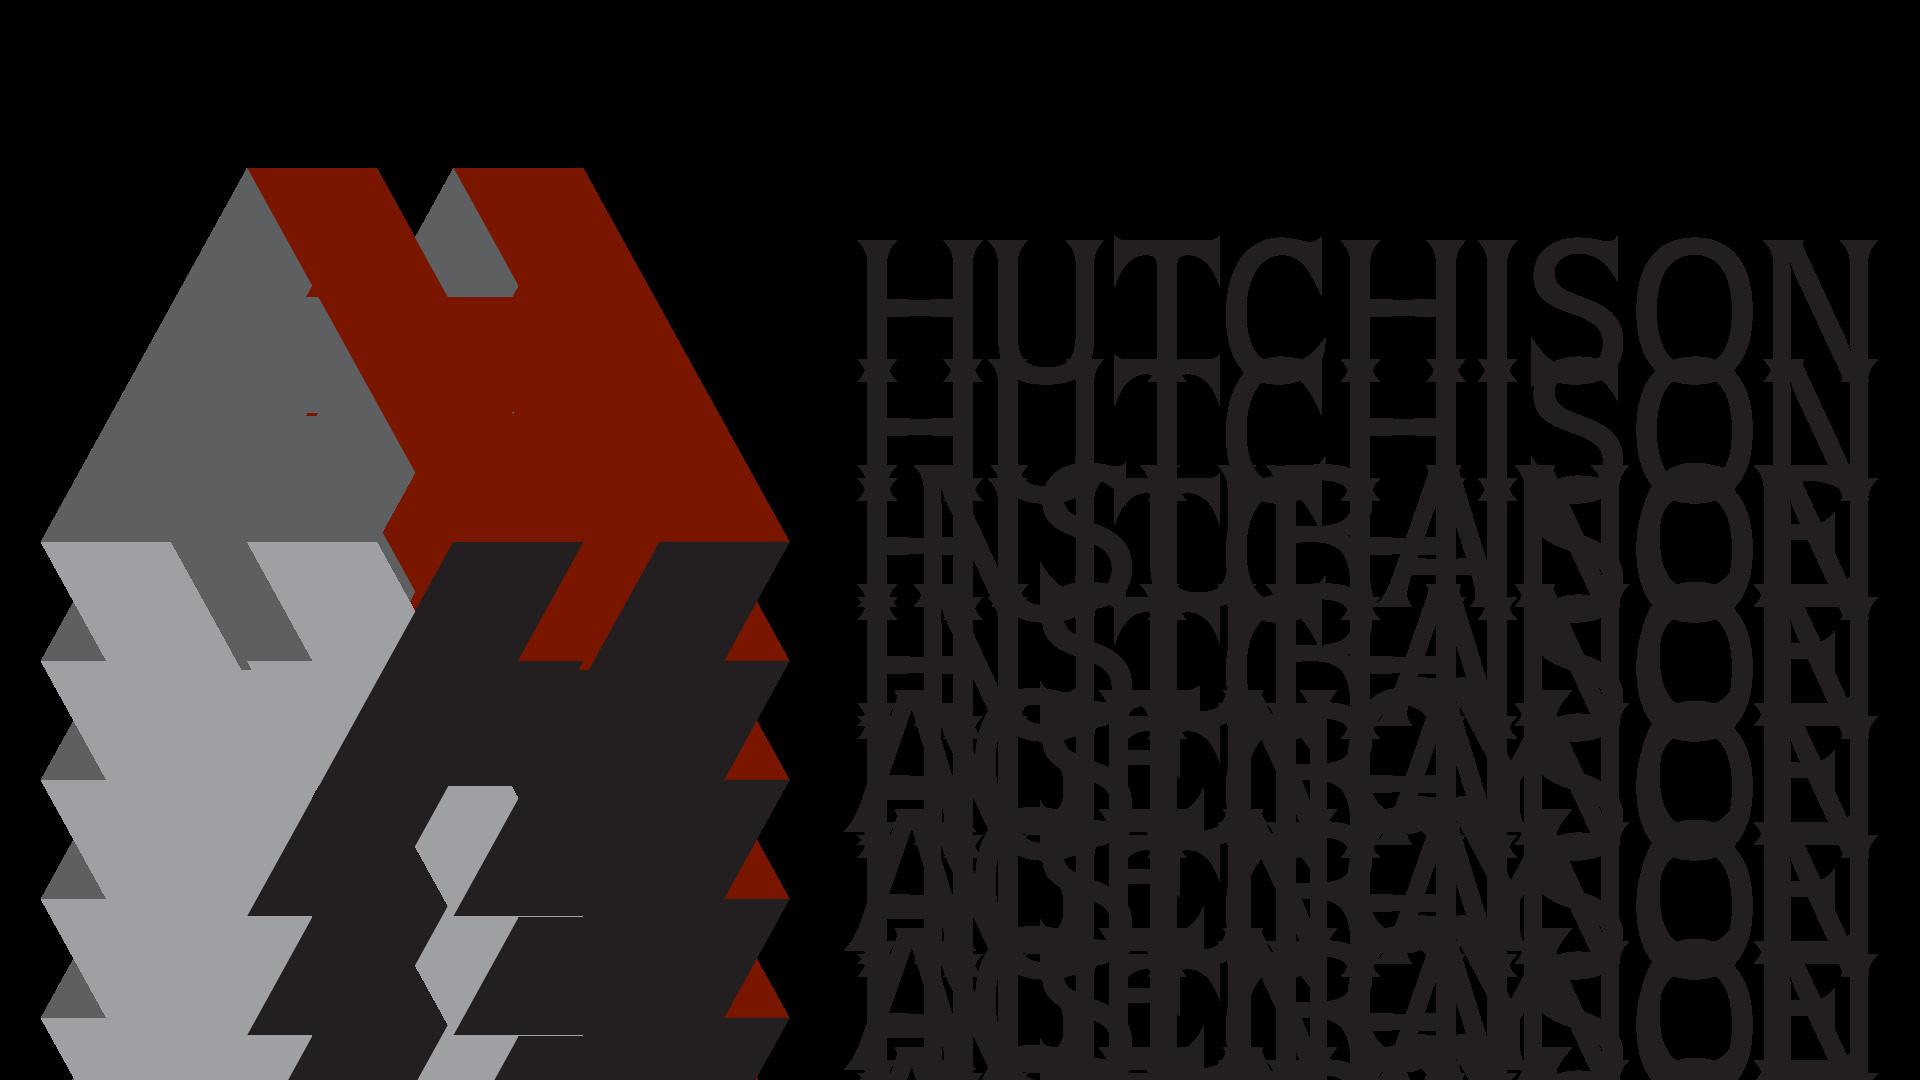 Hutchison.png